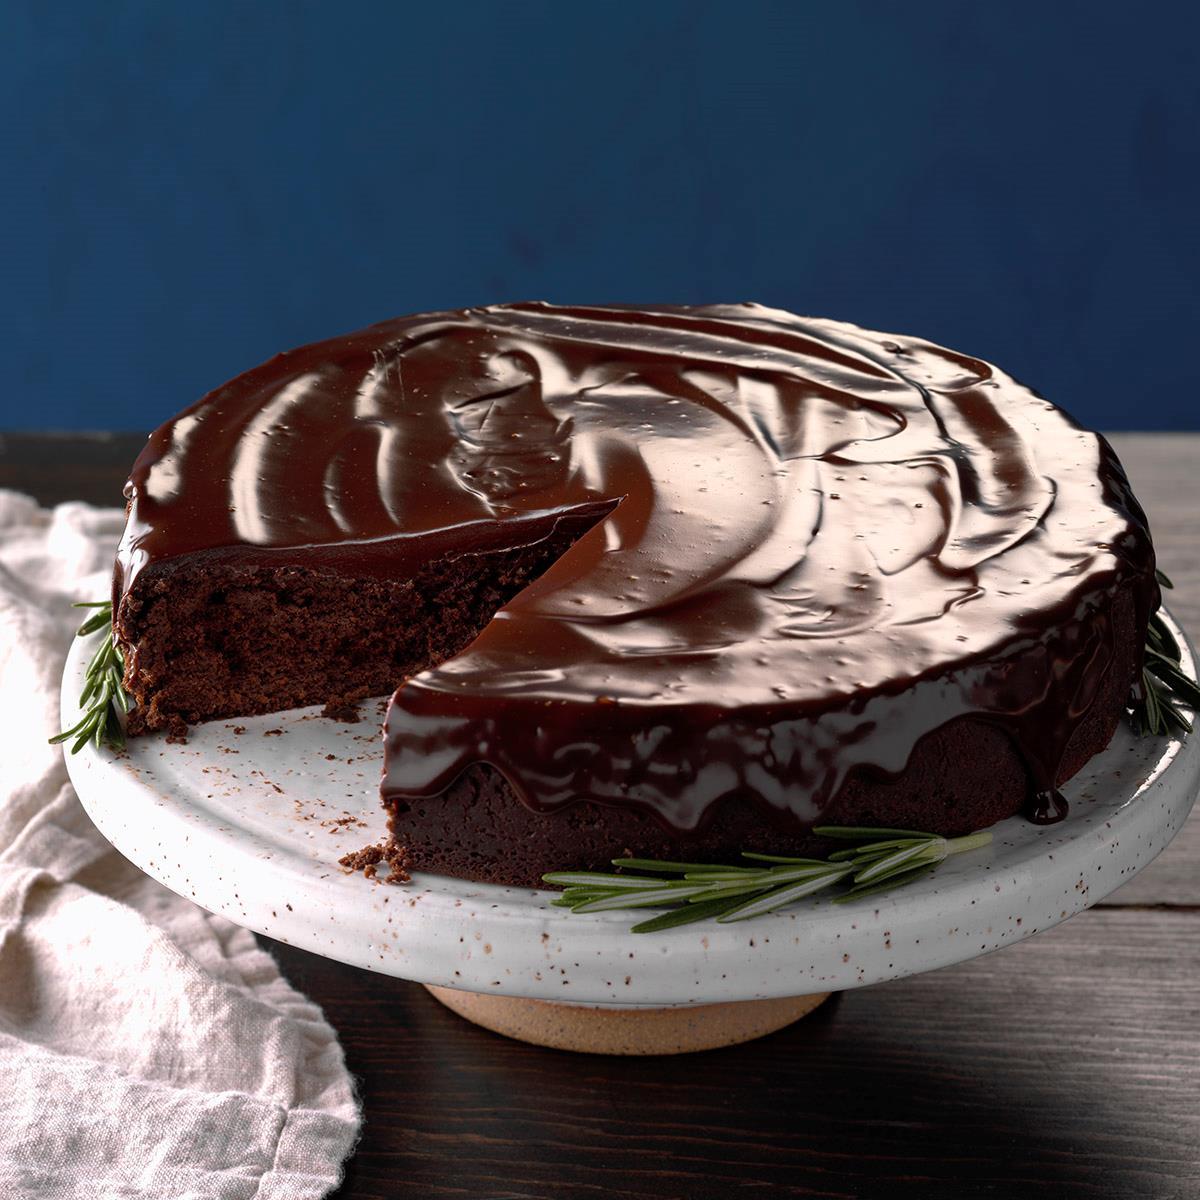 Flourless Chocolate Cake With Rosemary Ganache Recipe How To Make It Taste Of Home